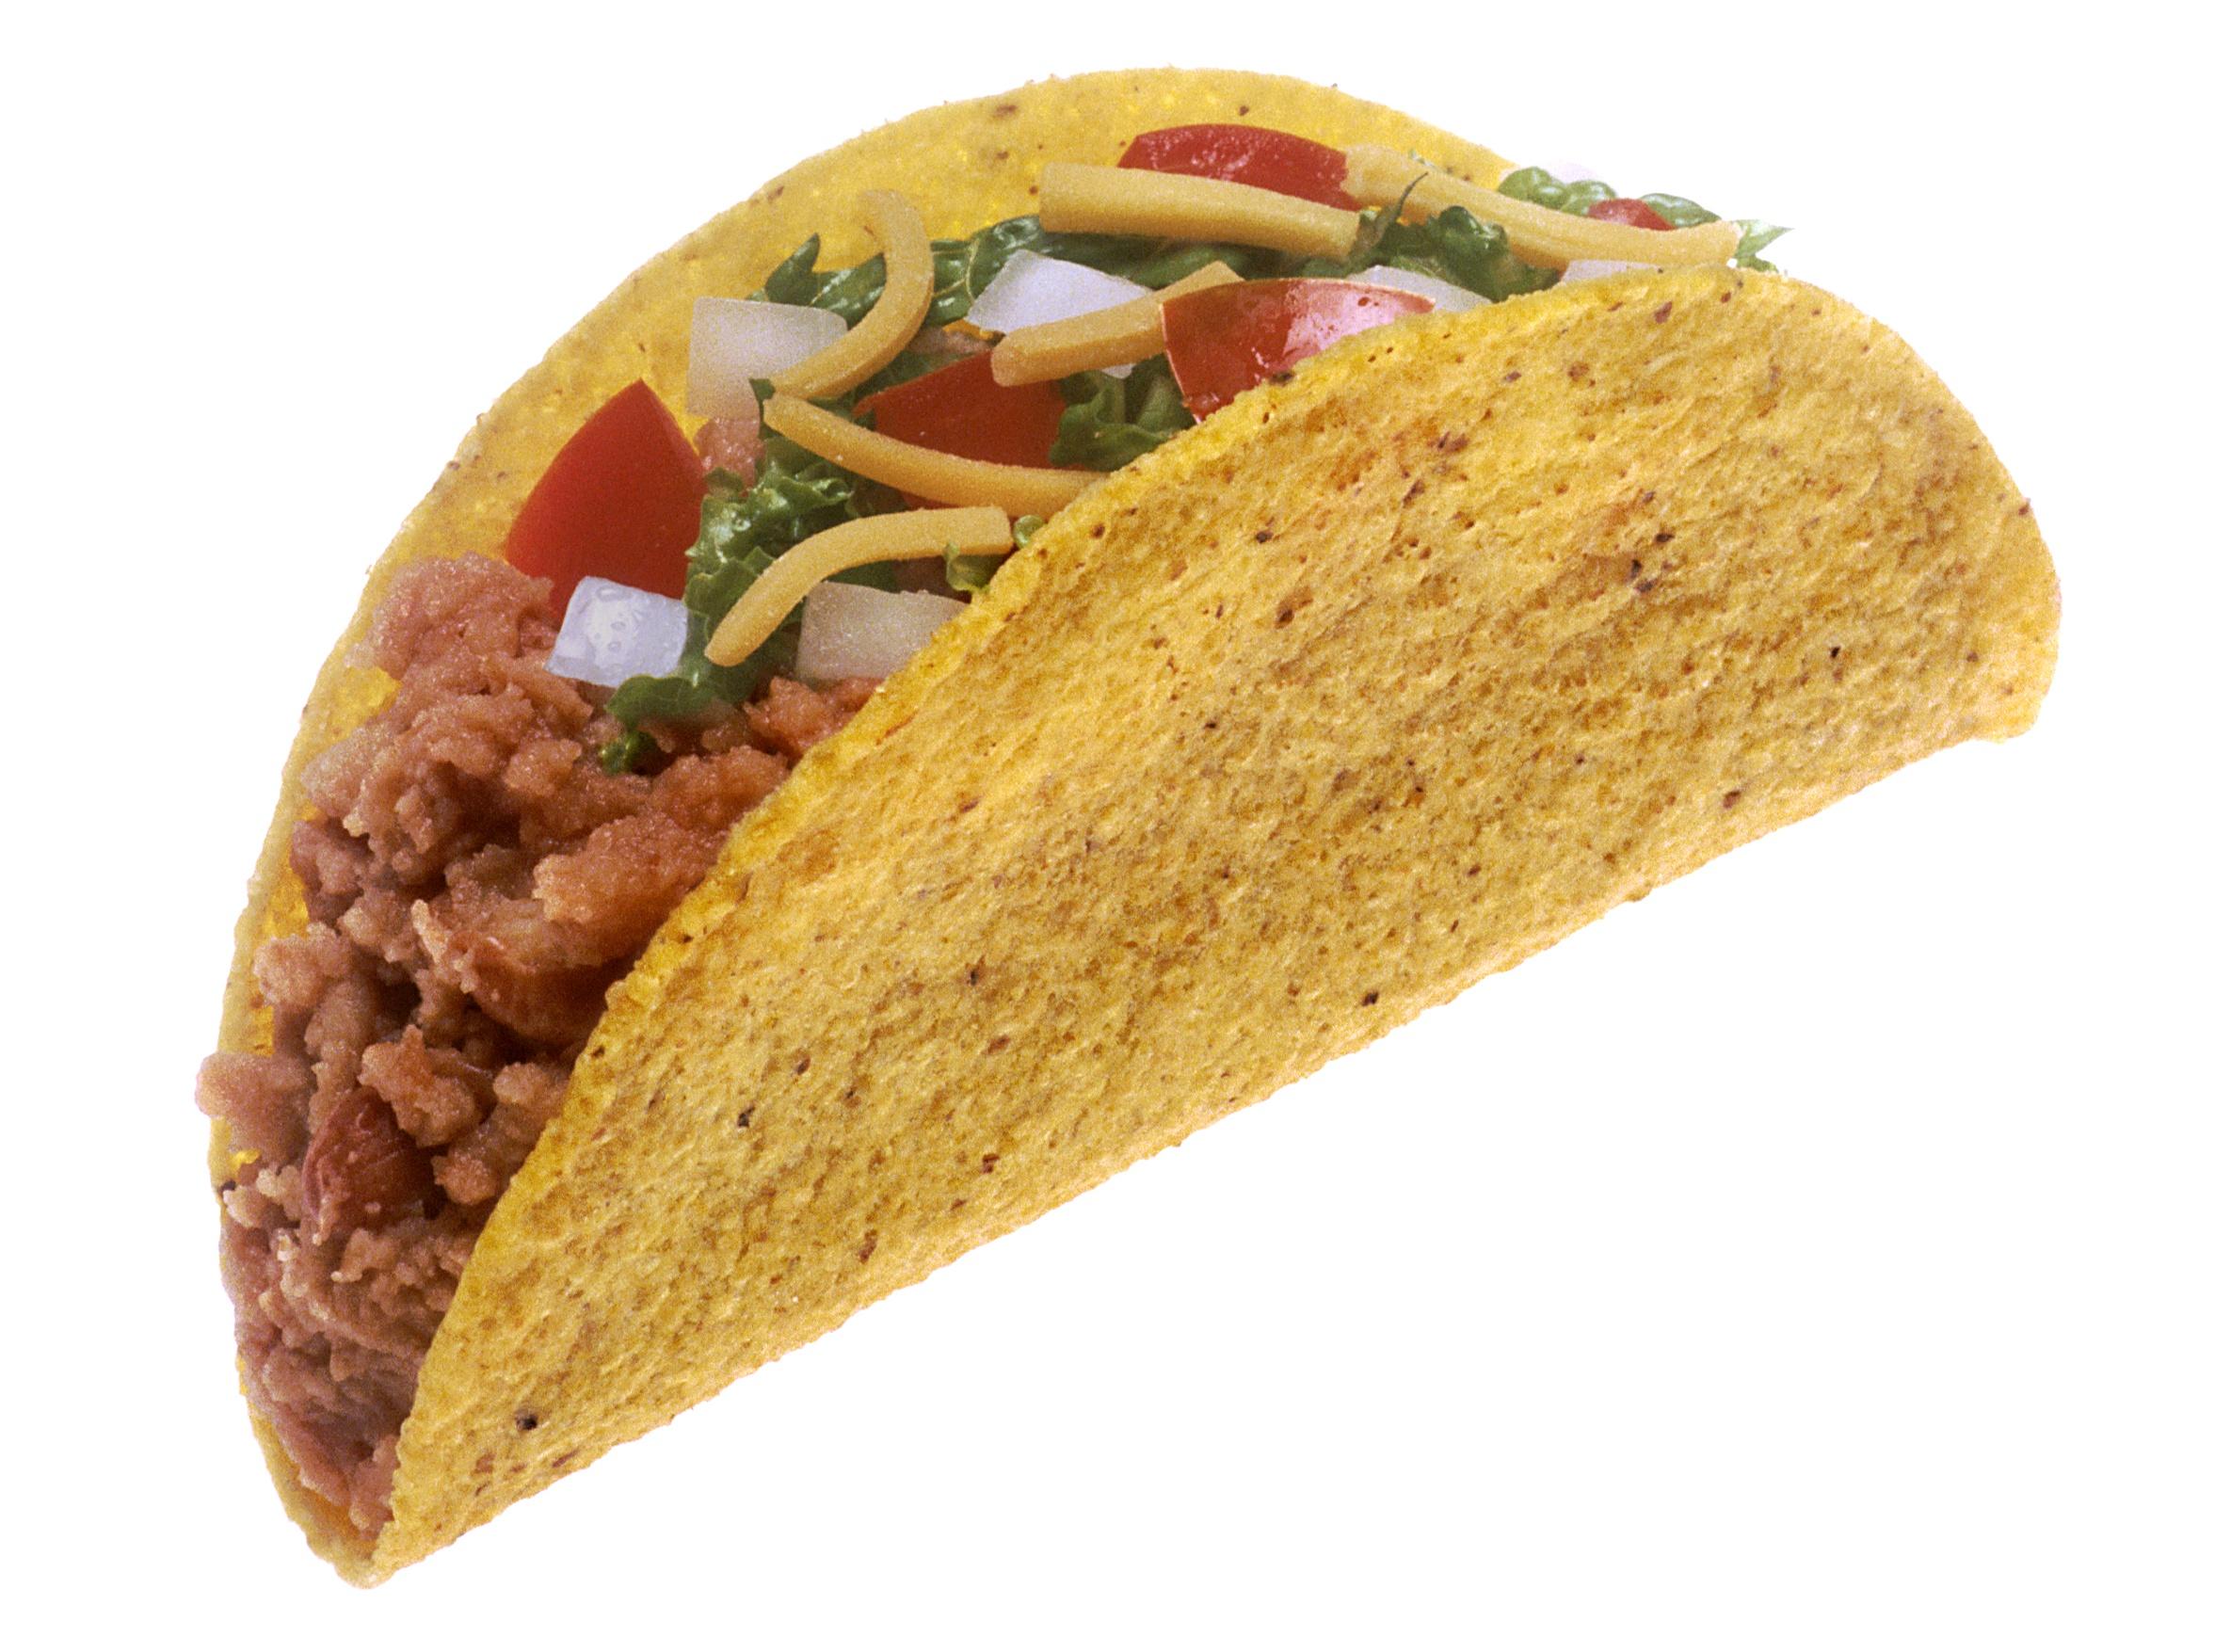 Mexican Food Tacos Presentation